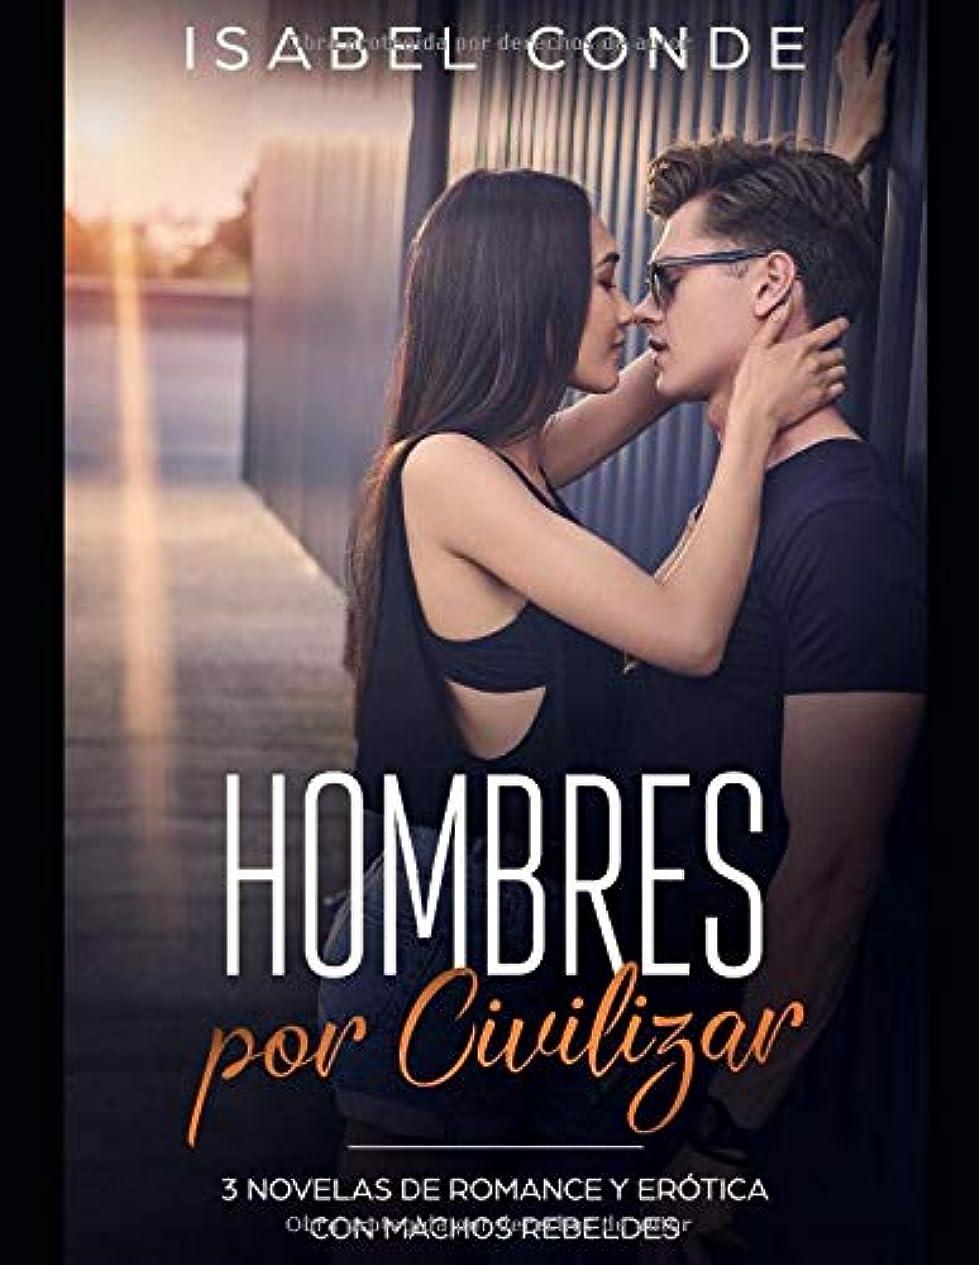 透過性想像力月面Hombres por Civilizar: 3 Novelas de Romance y Erótica con Machos Rebeldes (Colección Romántica y Erótica)